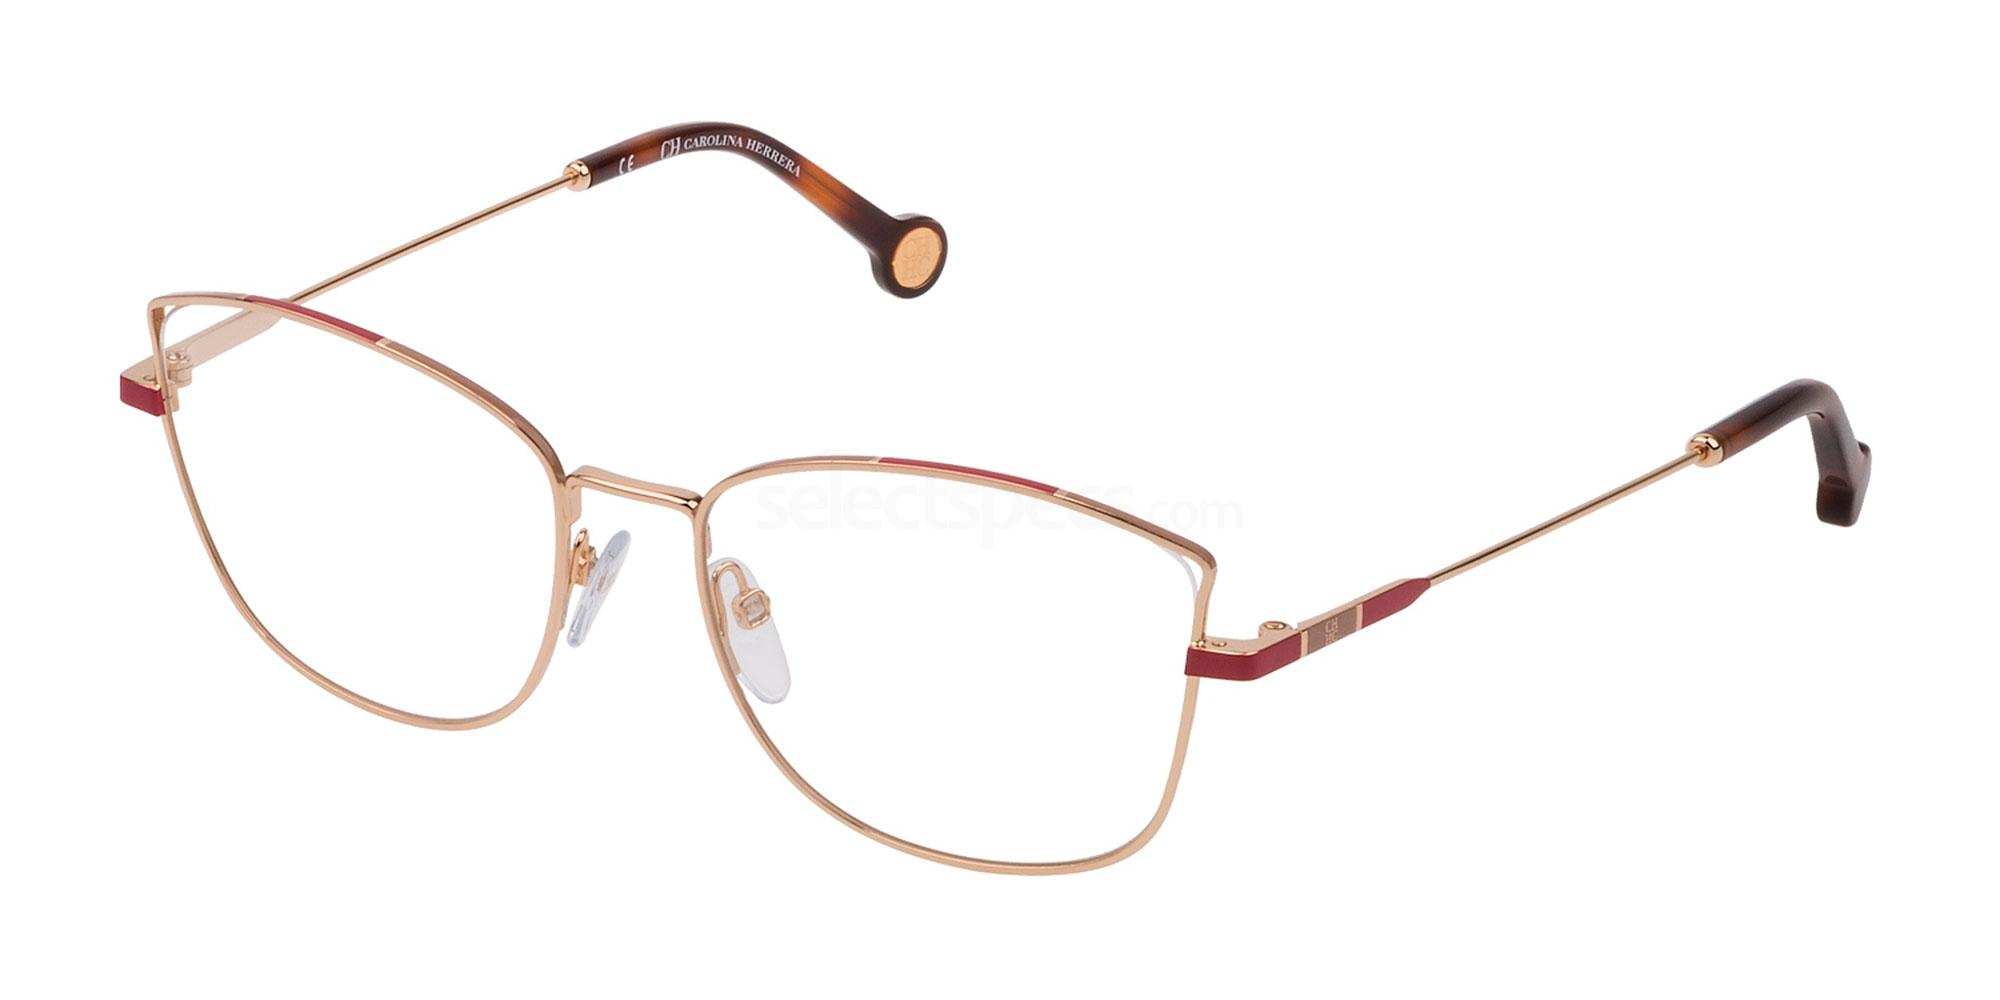 0300 VHE133 Glasses, CH Carolina Herrera